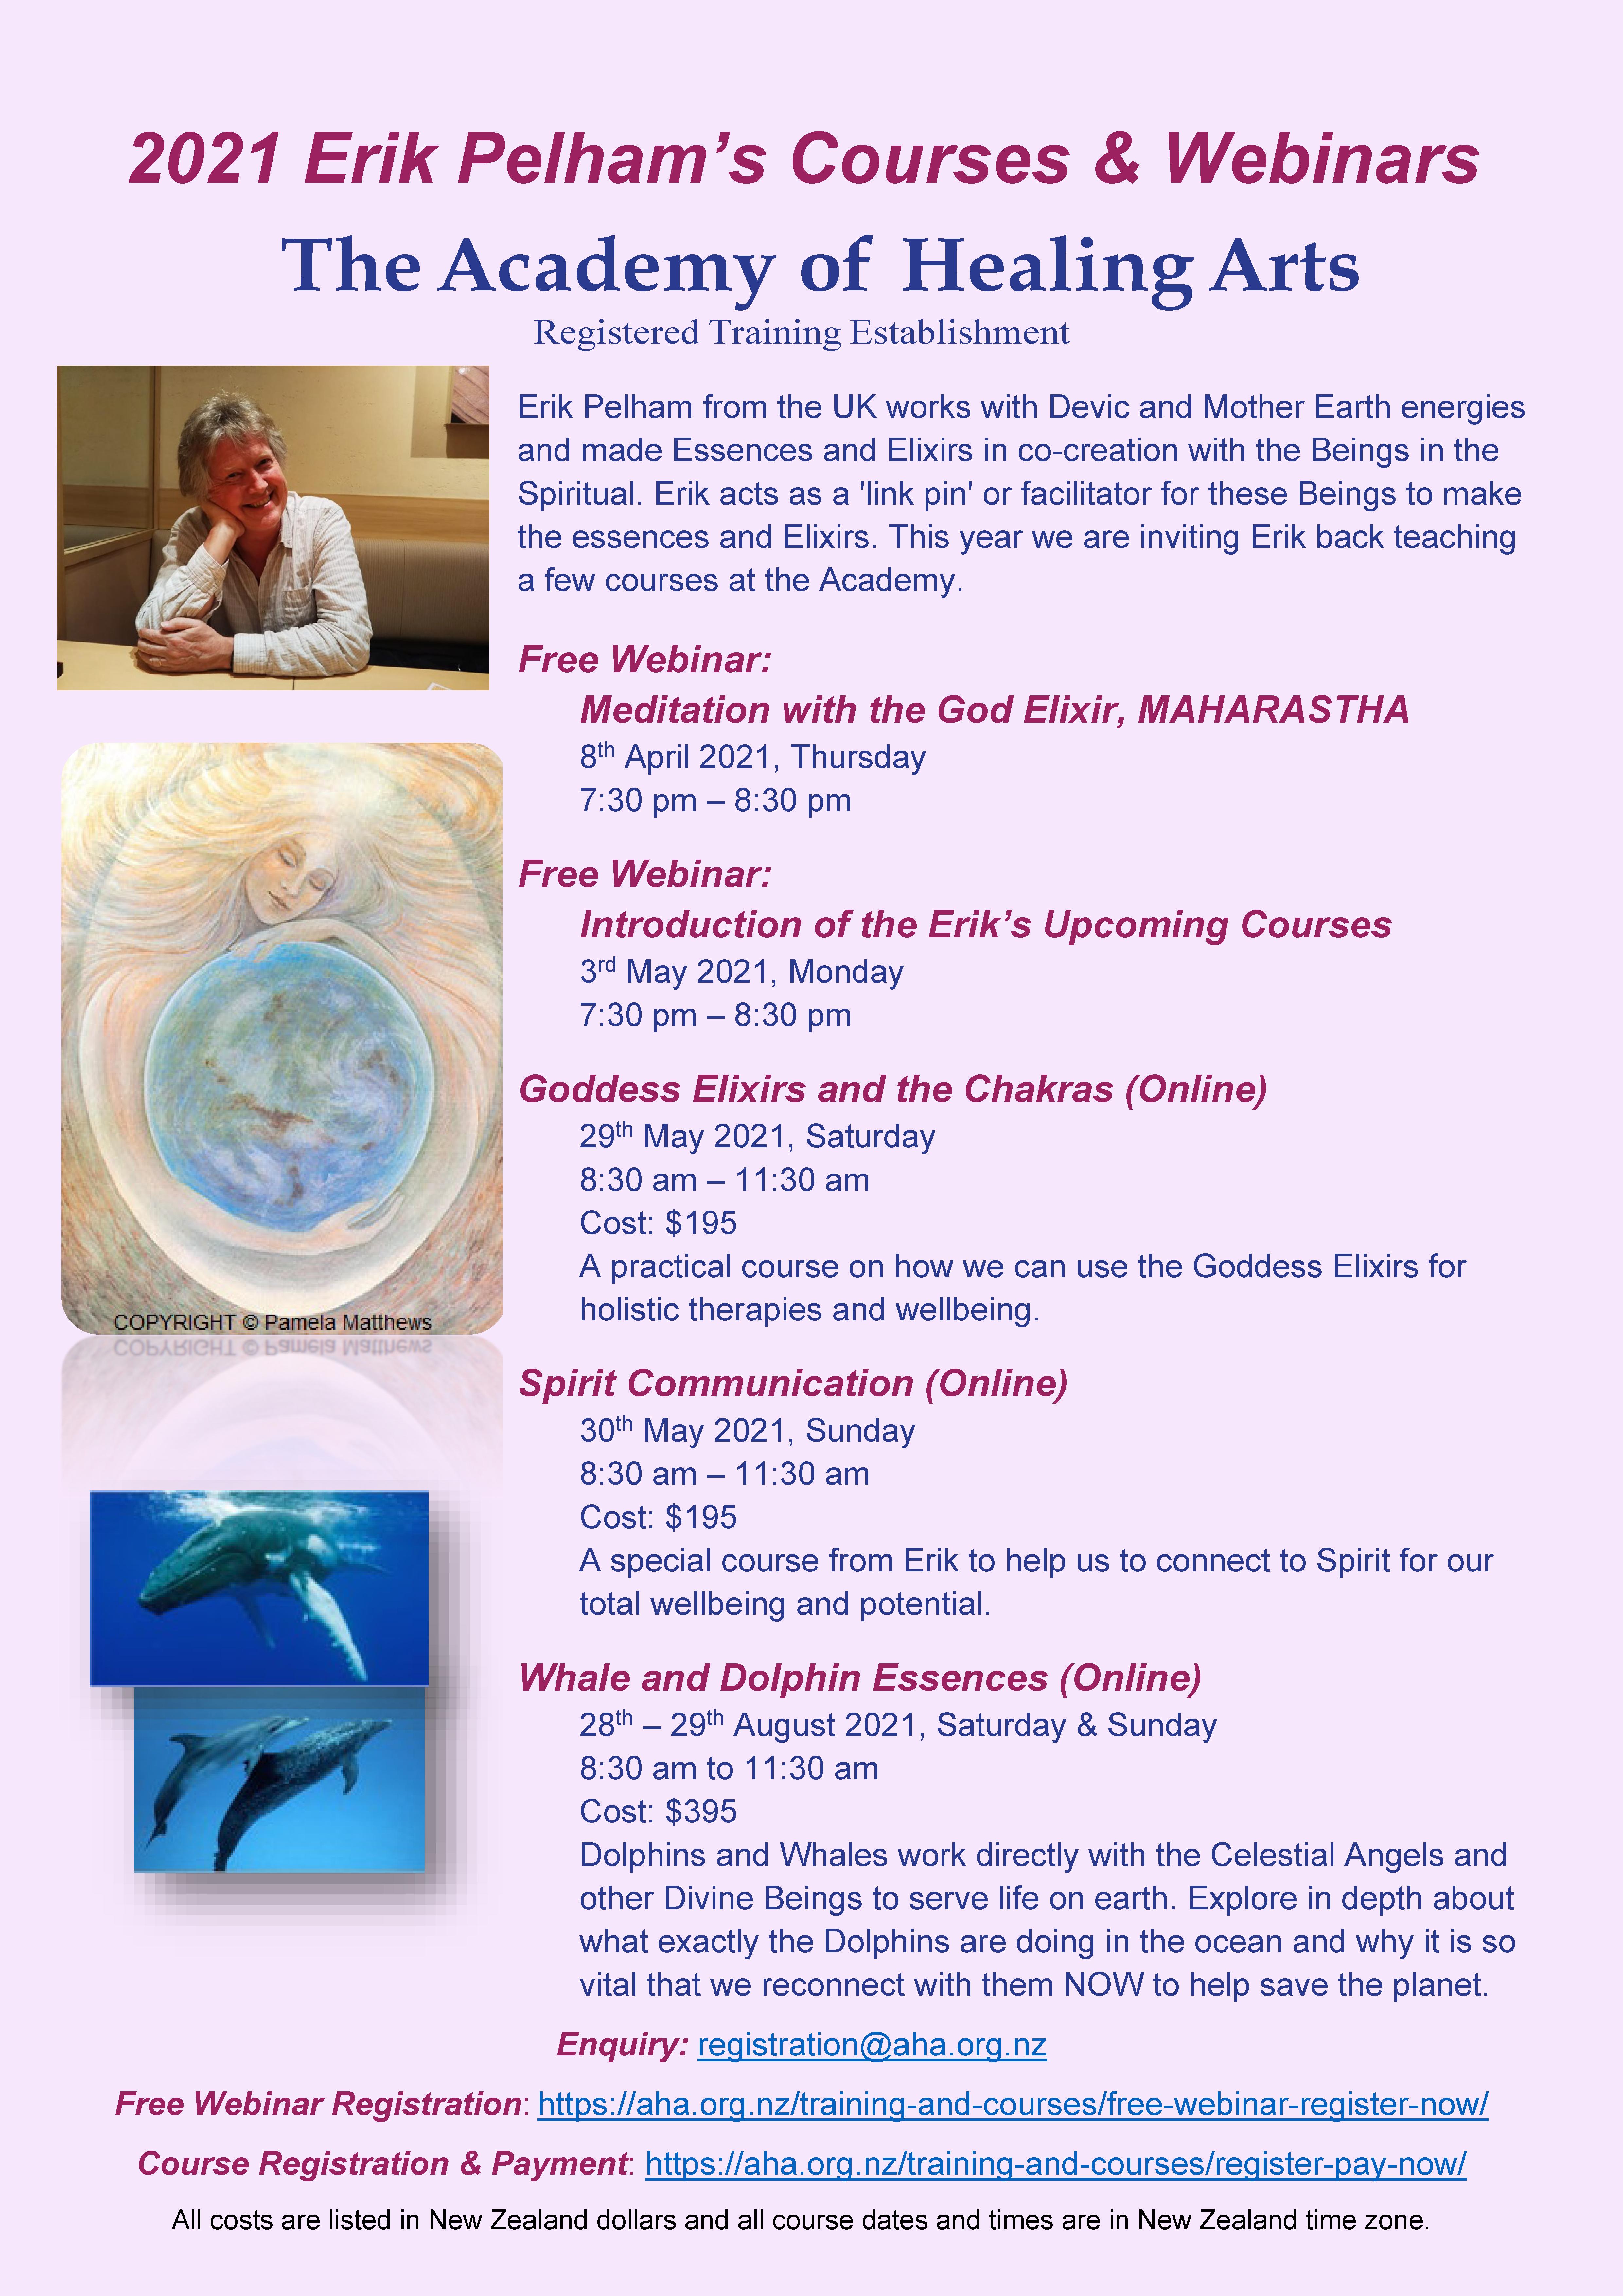 A2021 Erik Pelham's Courses and Free Webinars